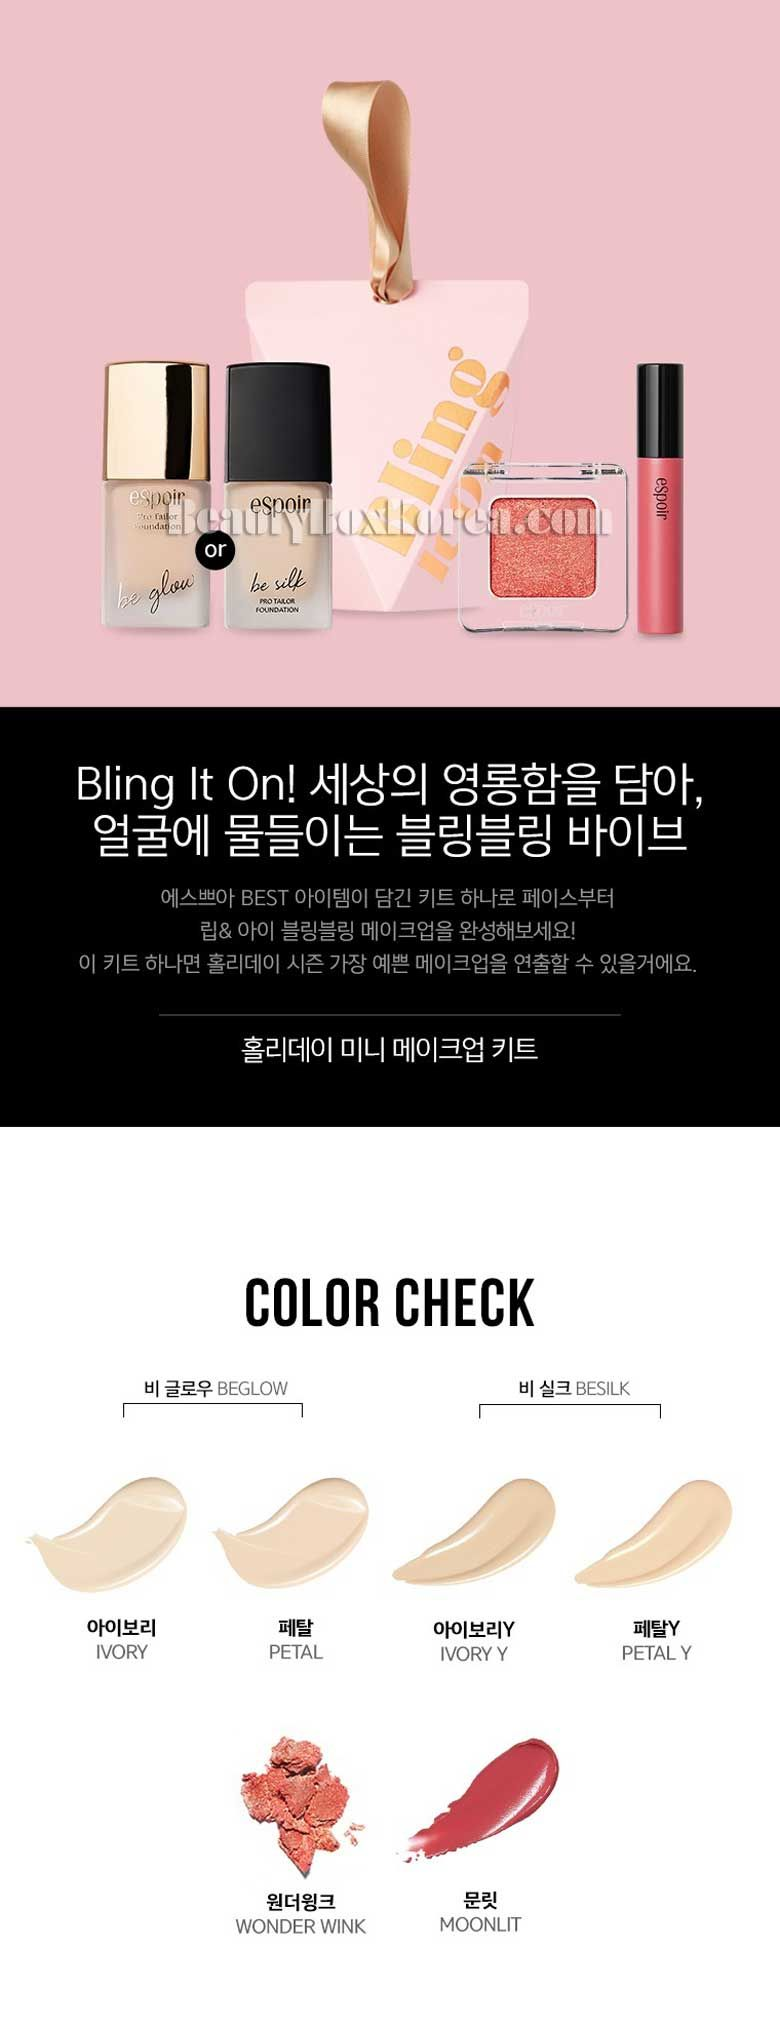 Espoir Bling Bling Mini Makeup Kit 3items Available Now Beauty Box